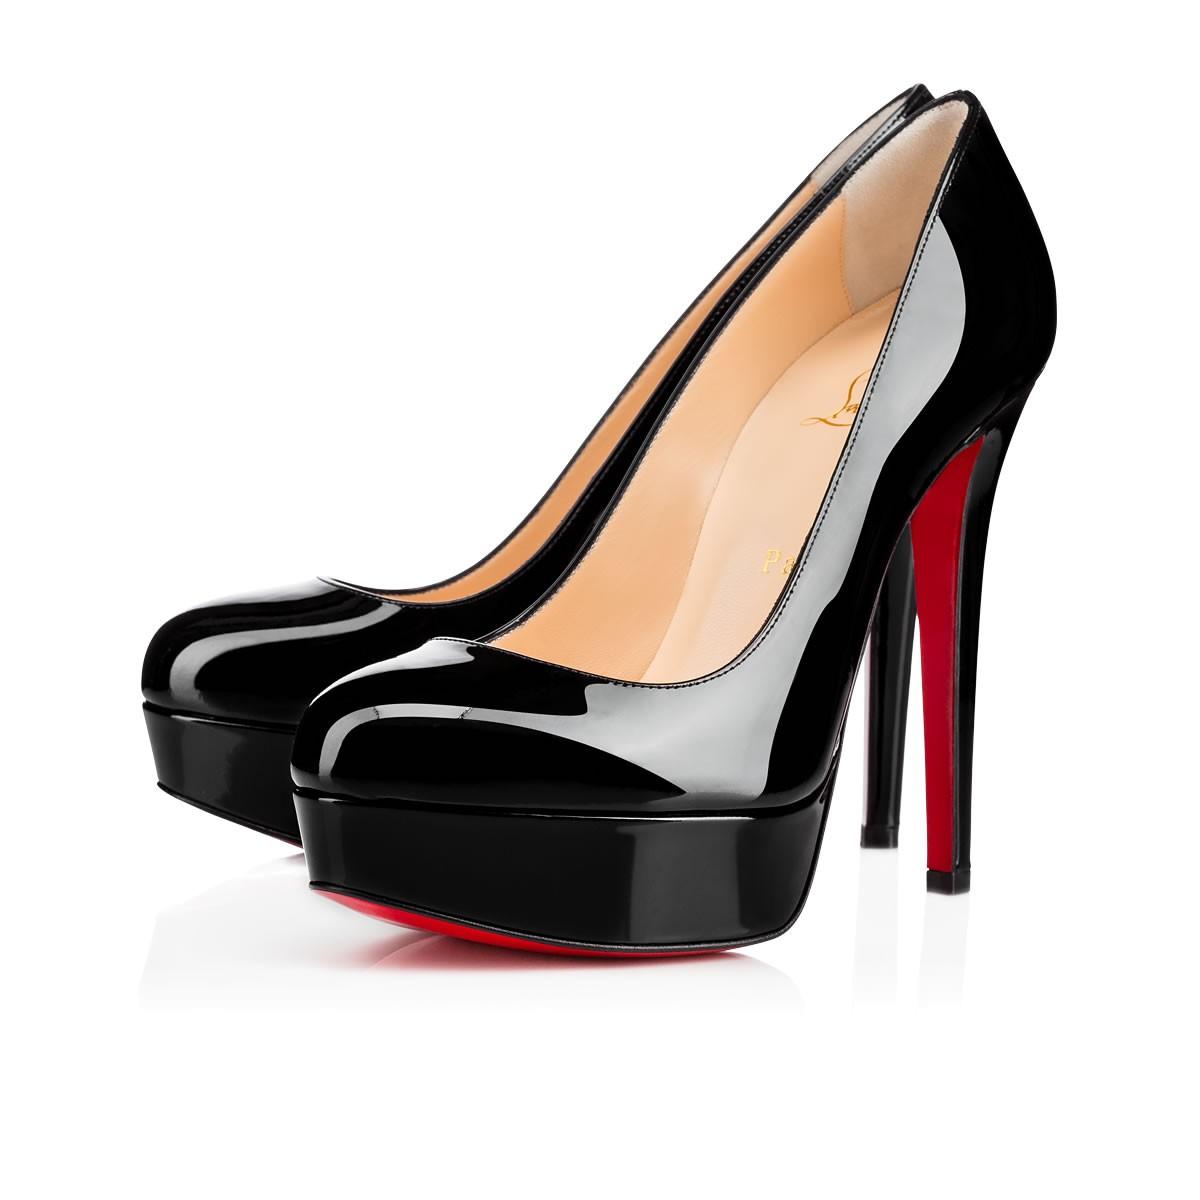 "11  Black Patent Leather ""Dirditta"" Platform Pumps"